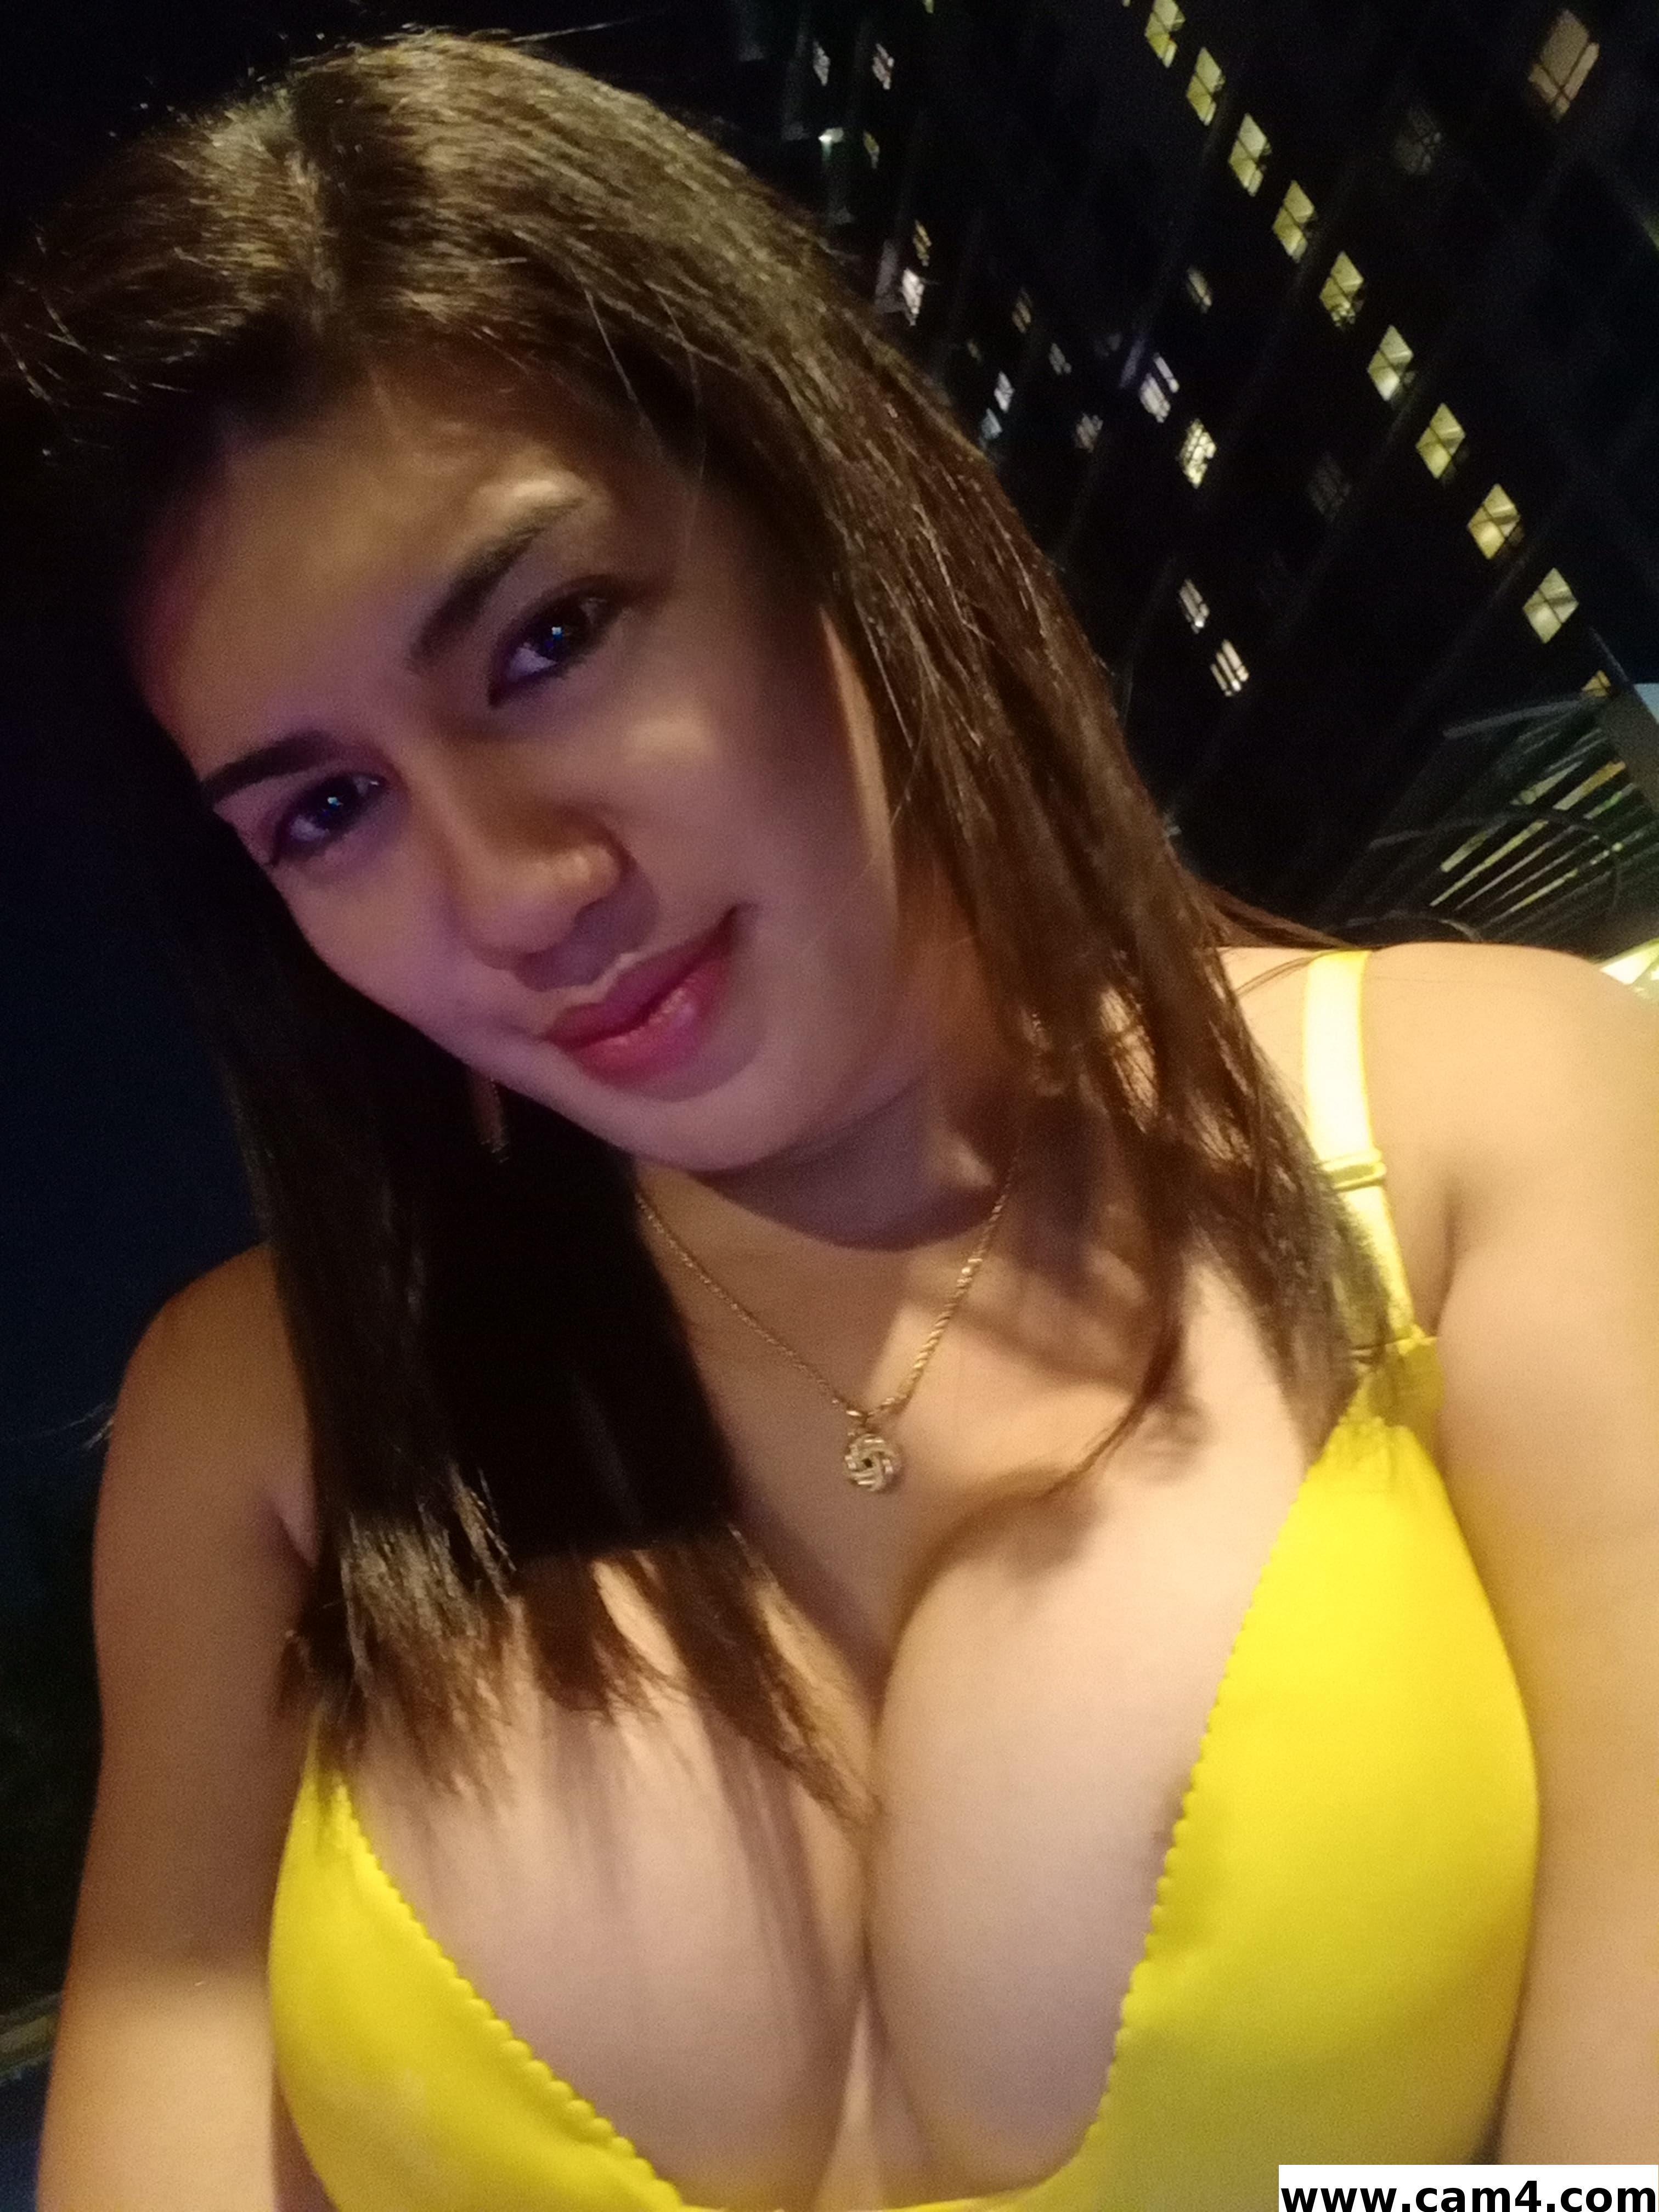 sexyfatcockk photo 13736690